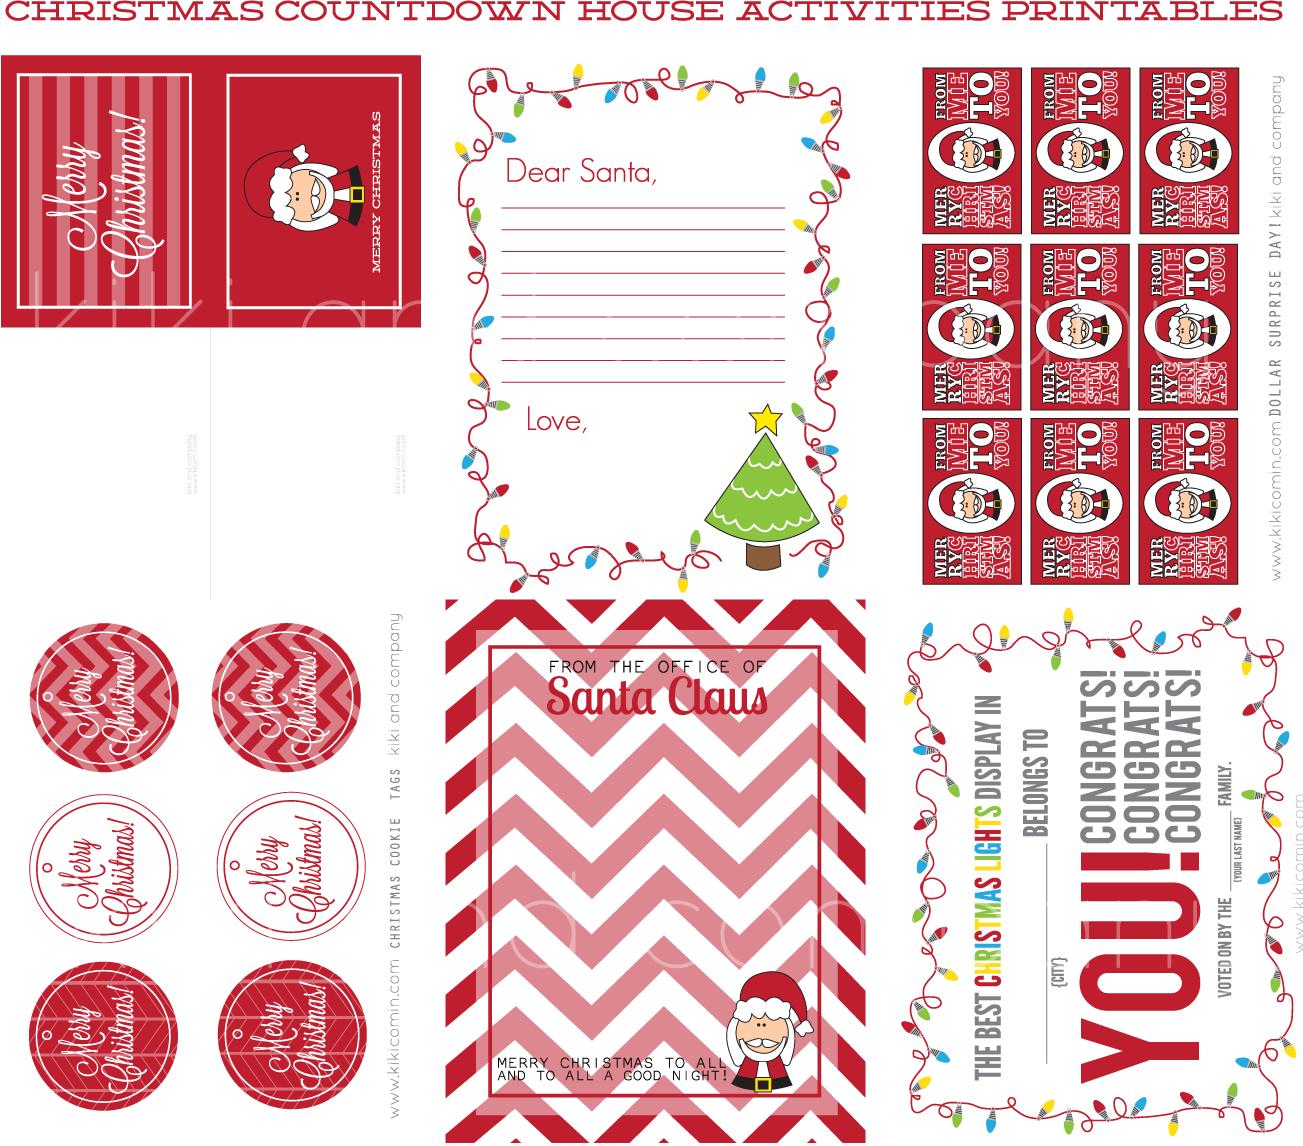 next - Free Printables For Christmas